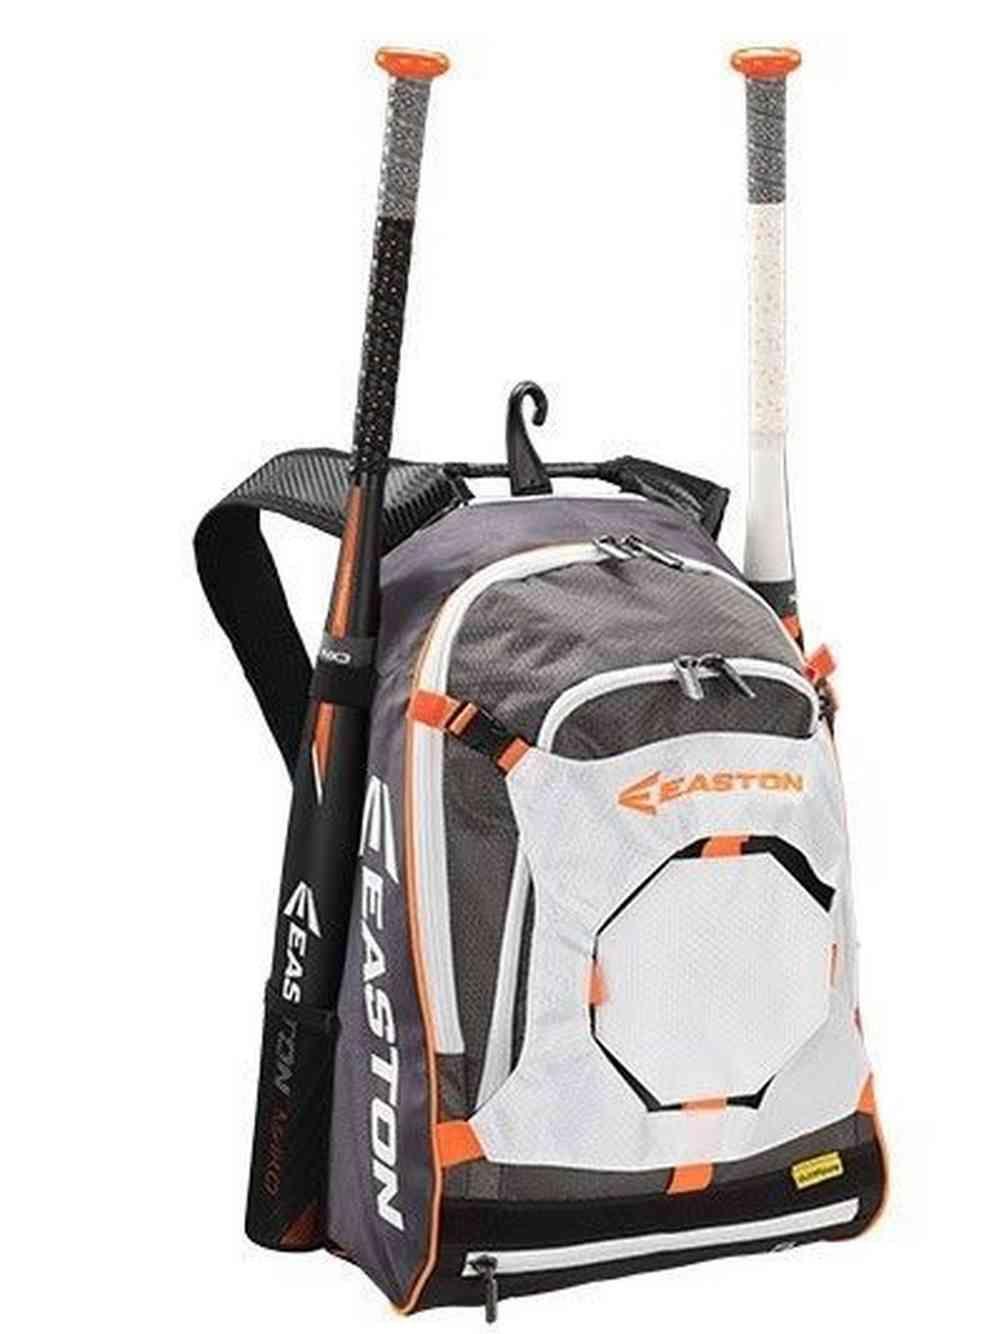 Easton Walk Off Ii Bat Pack Baseball Softball Equipment Bag A163210